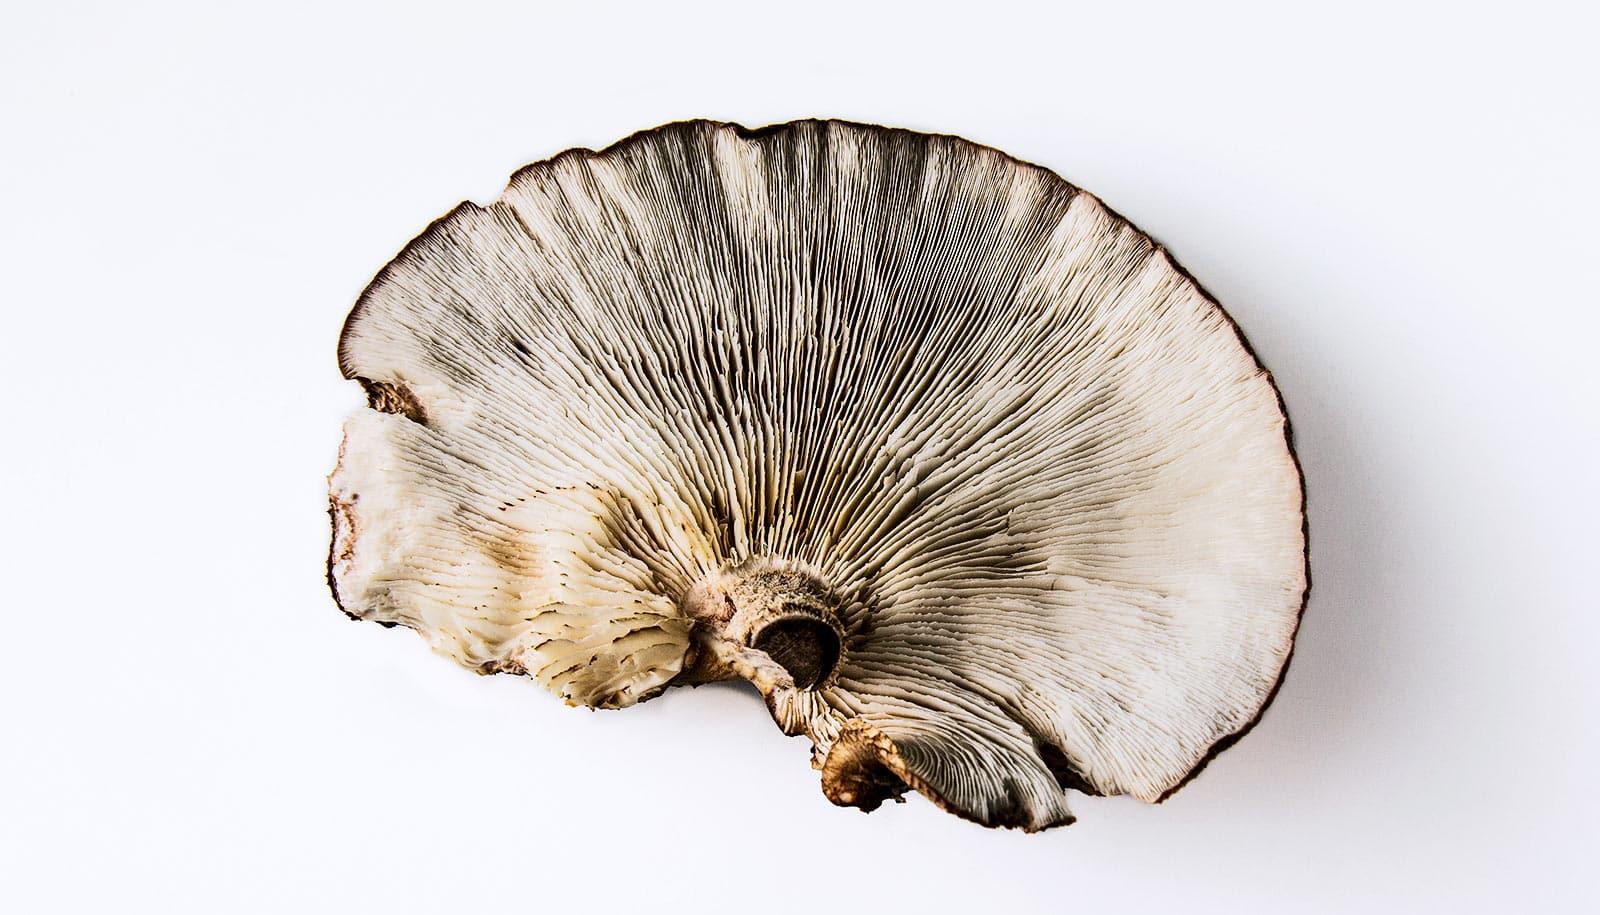 Eat mushrooms to keep your brain sharp? - Futurity